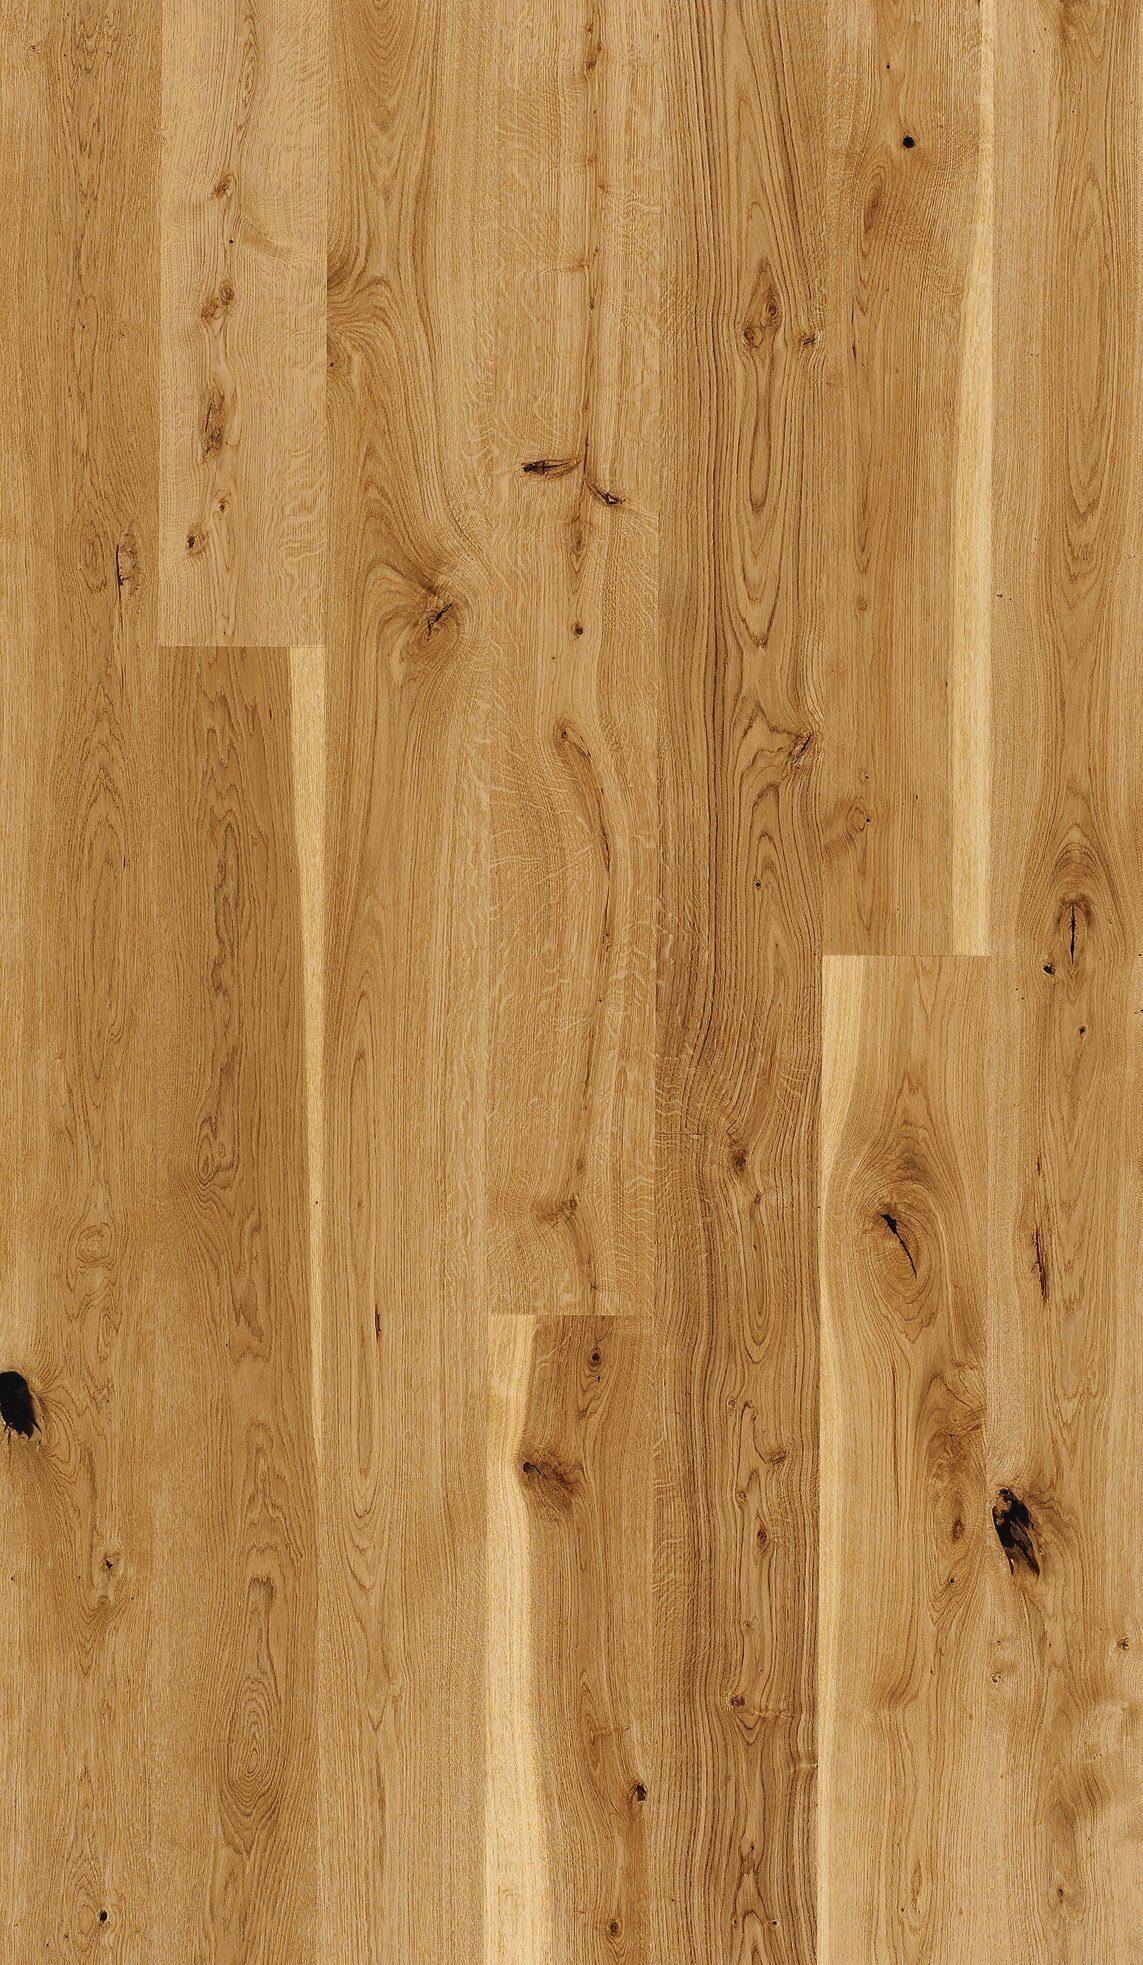 PARADOR Parkett »Basic Rustikal Eiche«, 1080 x 185 mm, Stärke: 11,5 mm, 2,2 m²